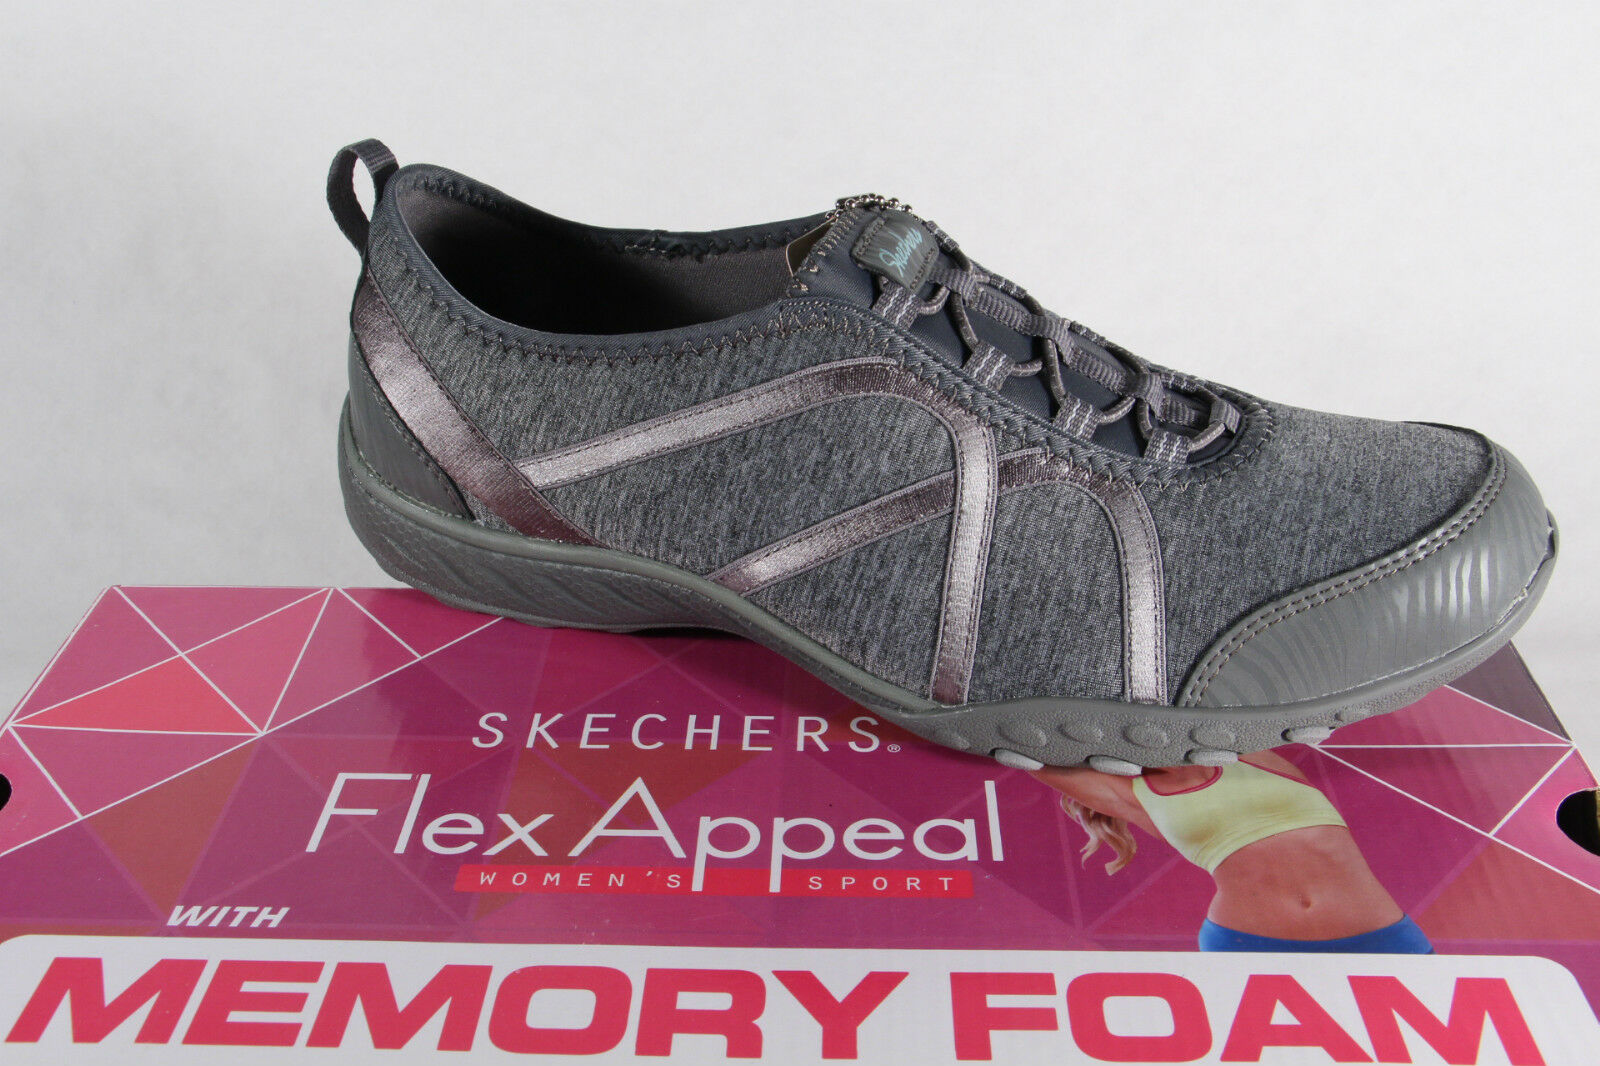 Skechers Slipper Basse Sneakers Scarpe Sportive Scarpe Basse Slipper morbido plantare NUOVO! c74079